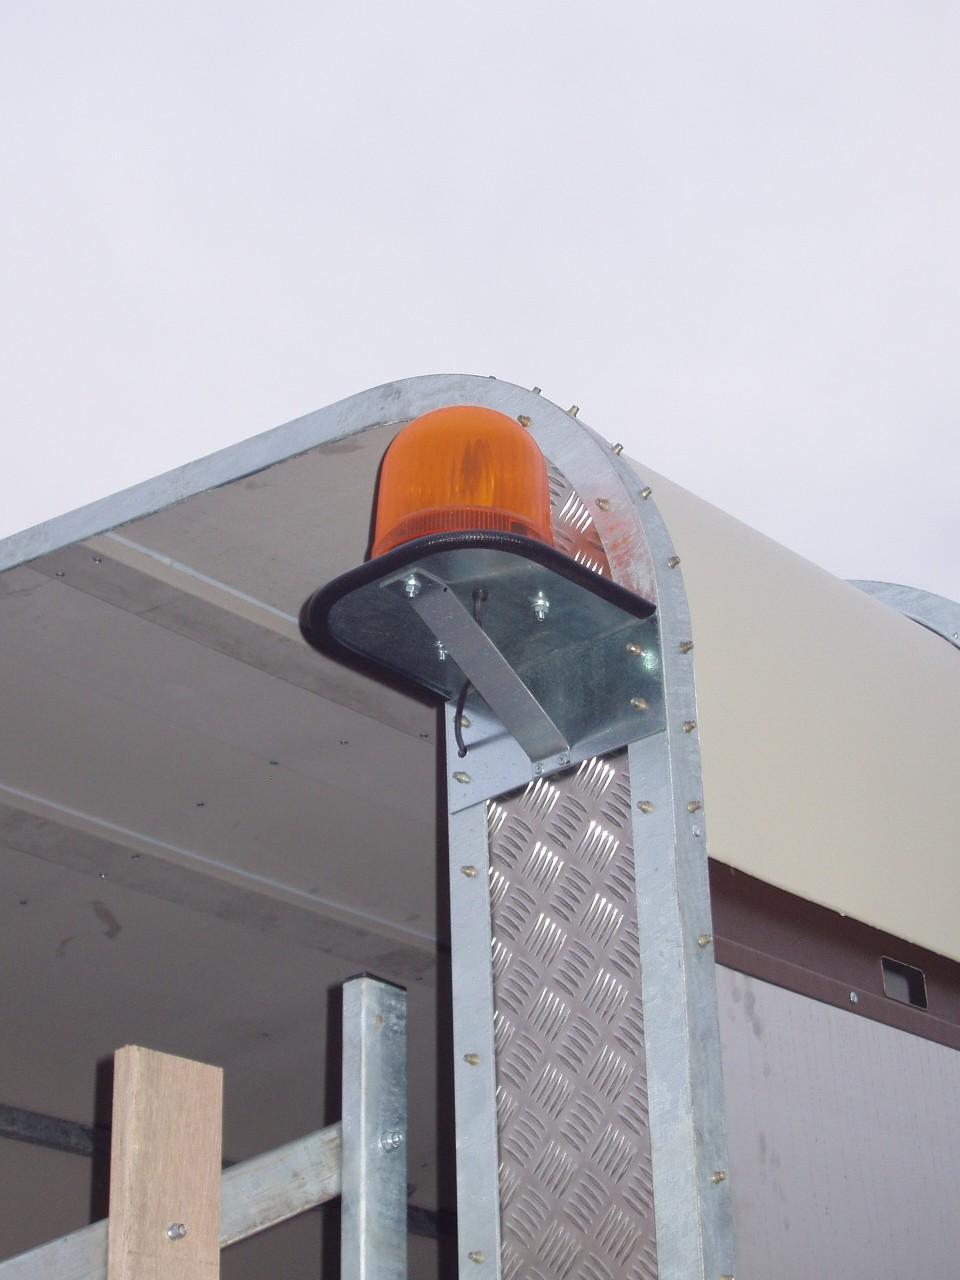 Optional Amber Beacon on Rear Corner